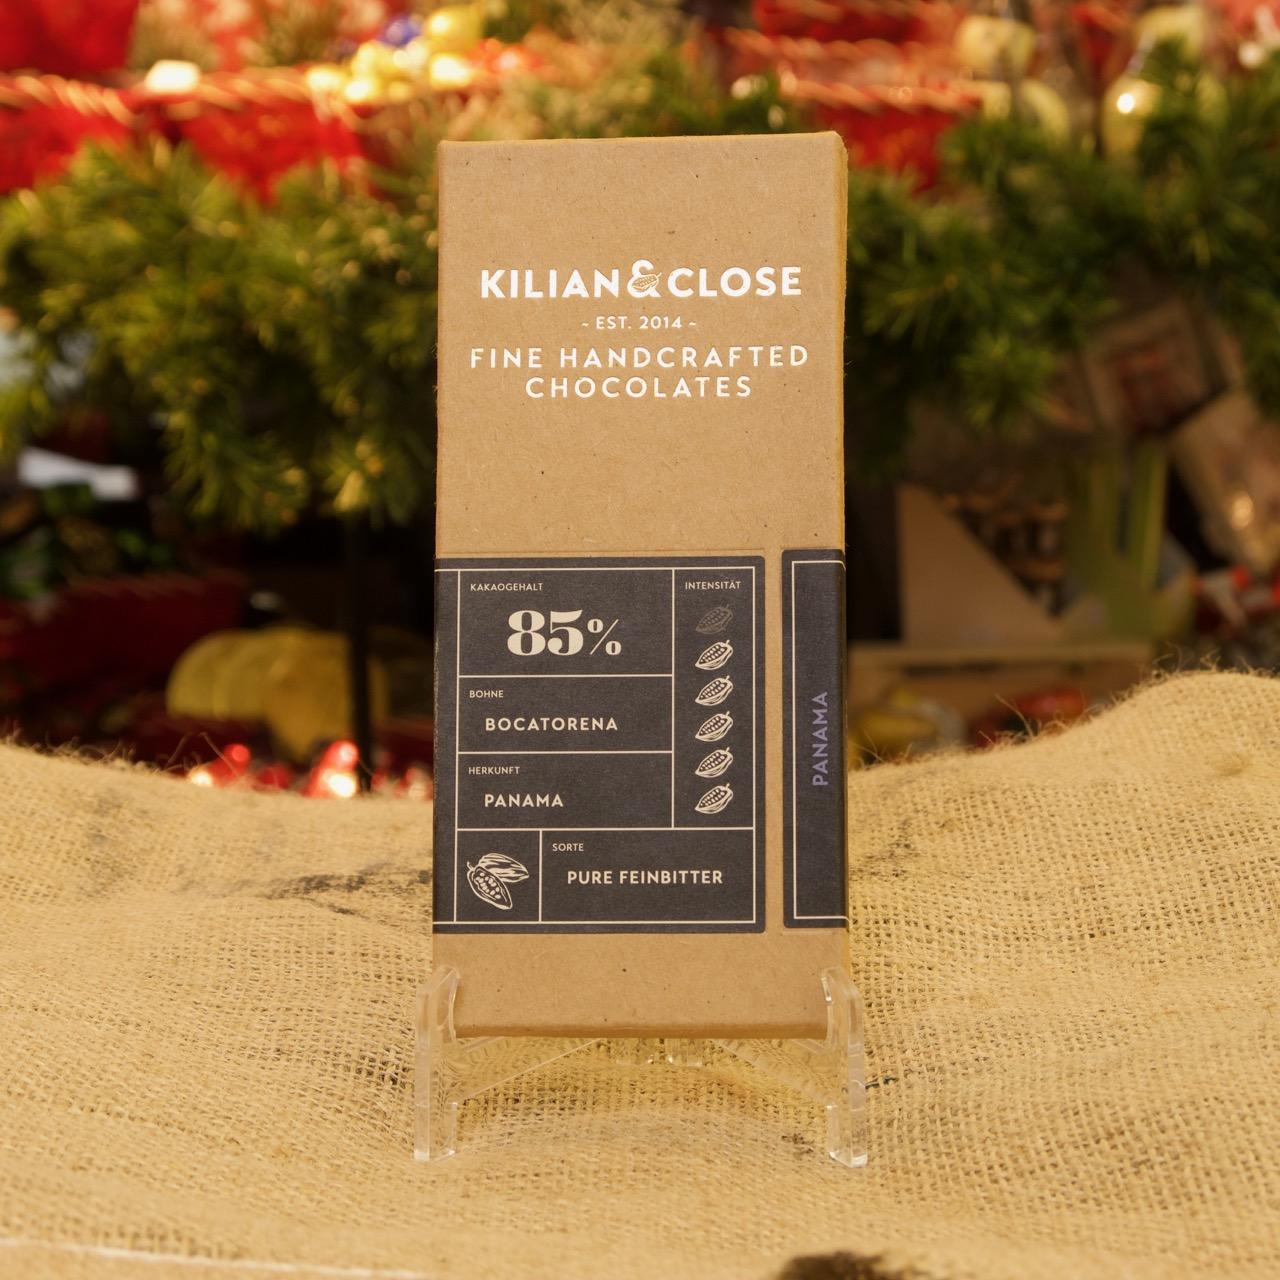 kilian close 85 panama schokolade s sses n lker. Black Bedroom Furniture Sets. Home Design Ideas